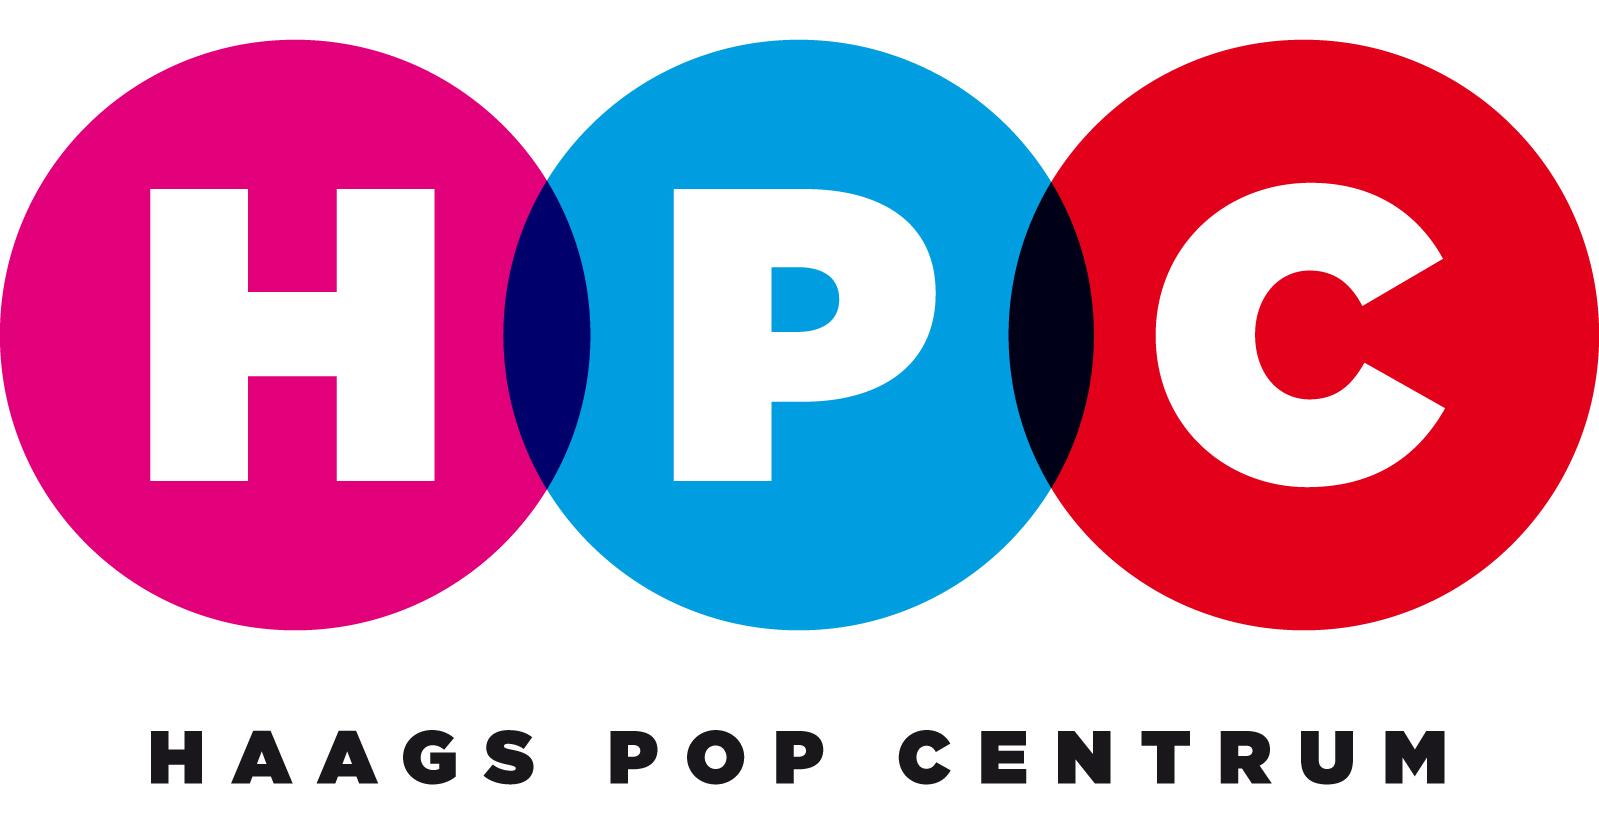 Haags Pop Centrum